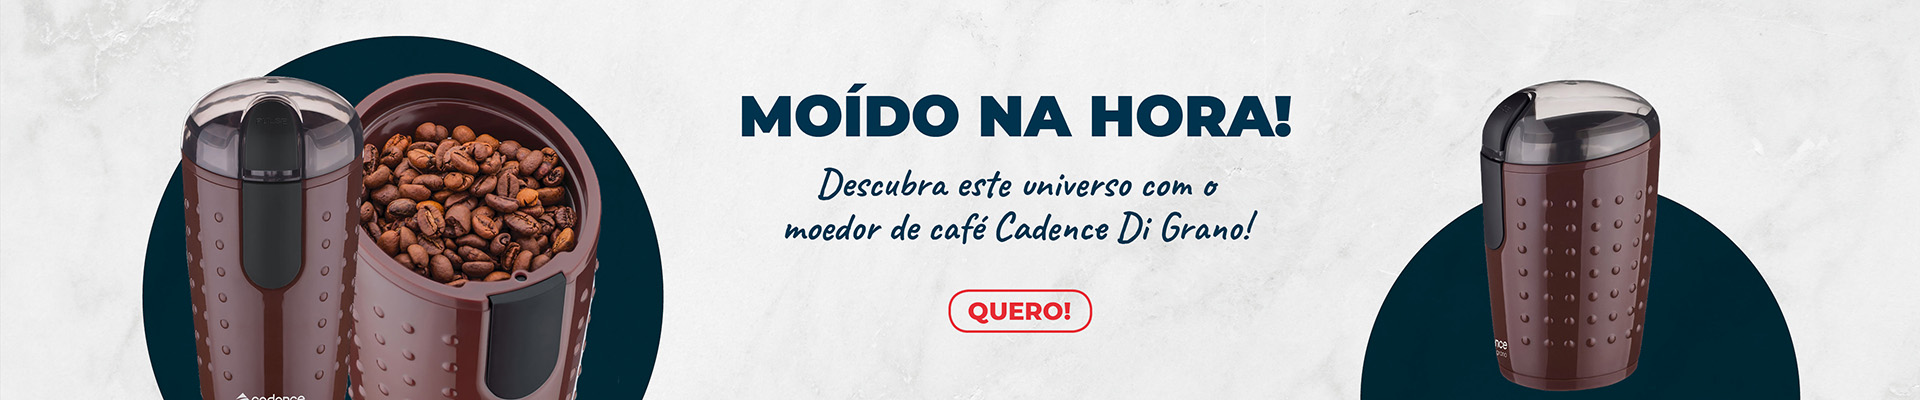 Moedor Cadence